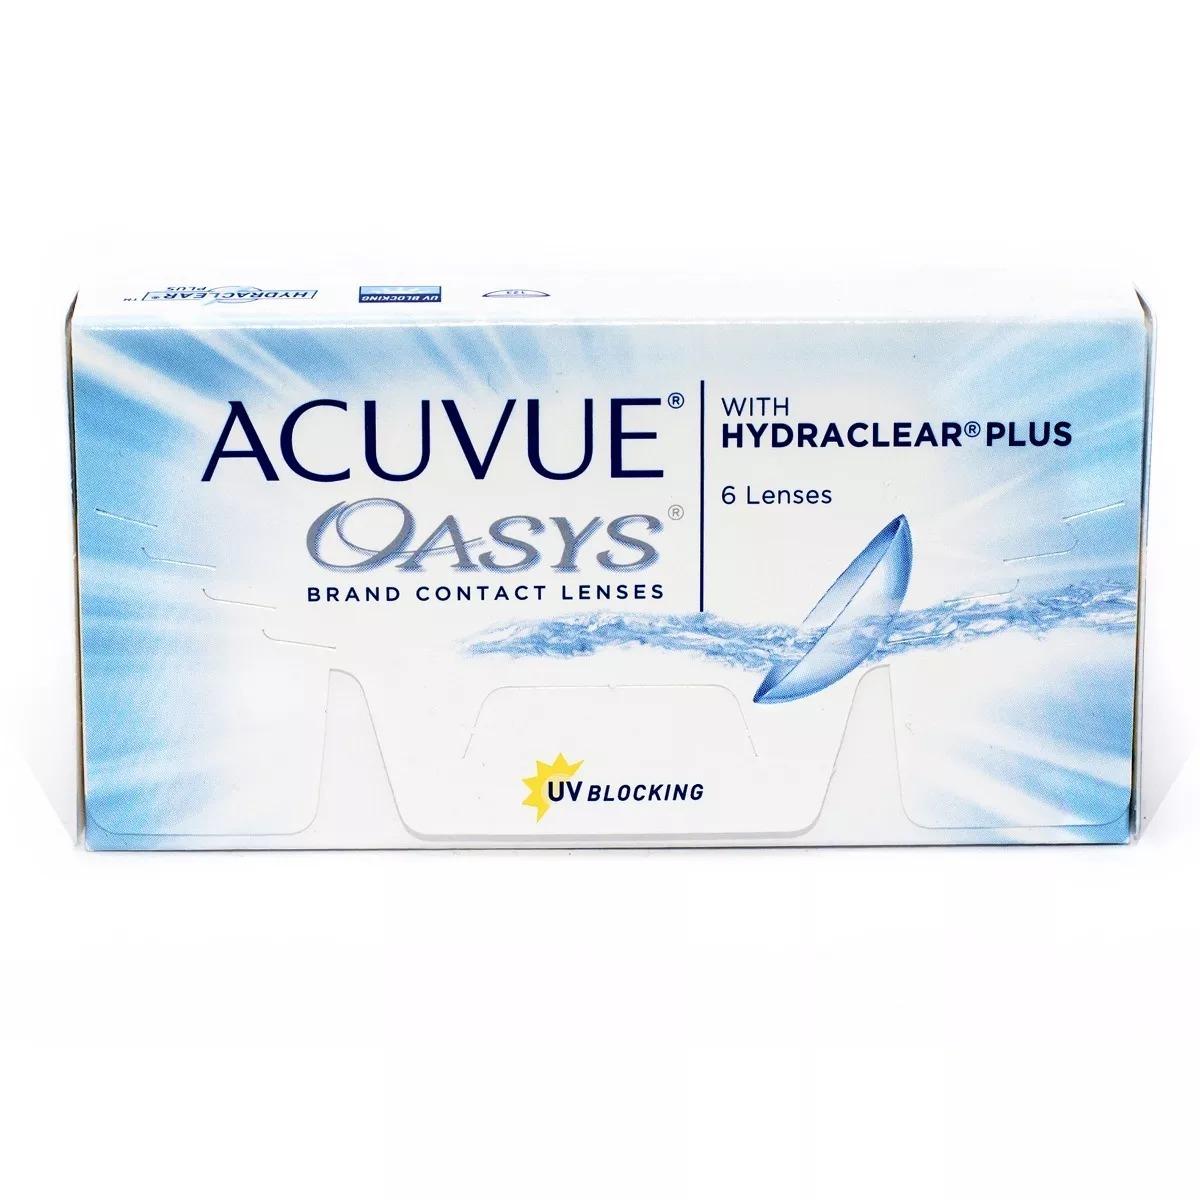 Lentes De Contato Acuvue Oasys Com Hydraclear Plus +3,25 - R  99,99 ... f797edf600